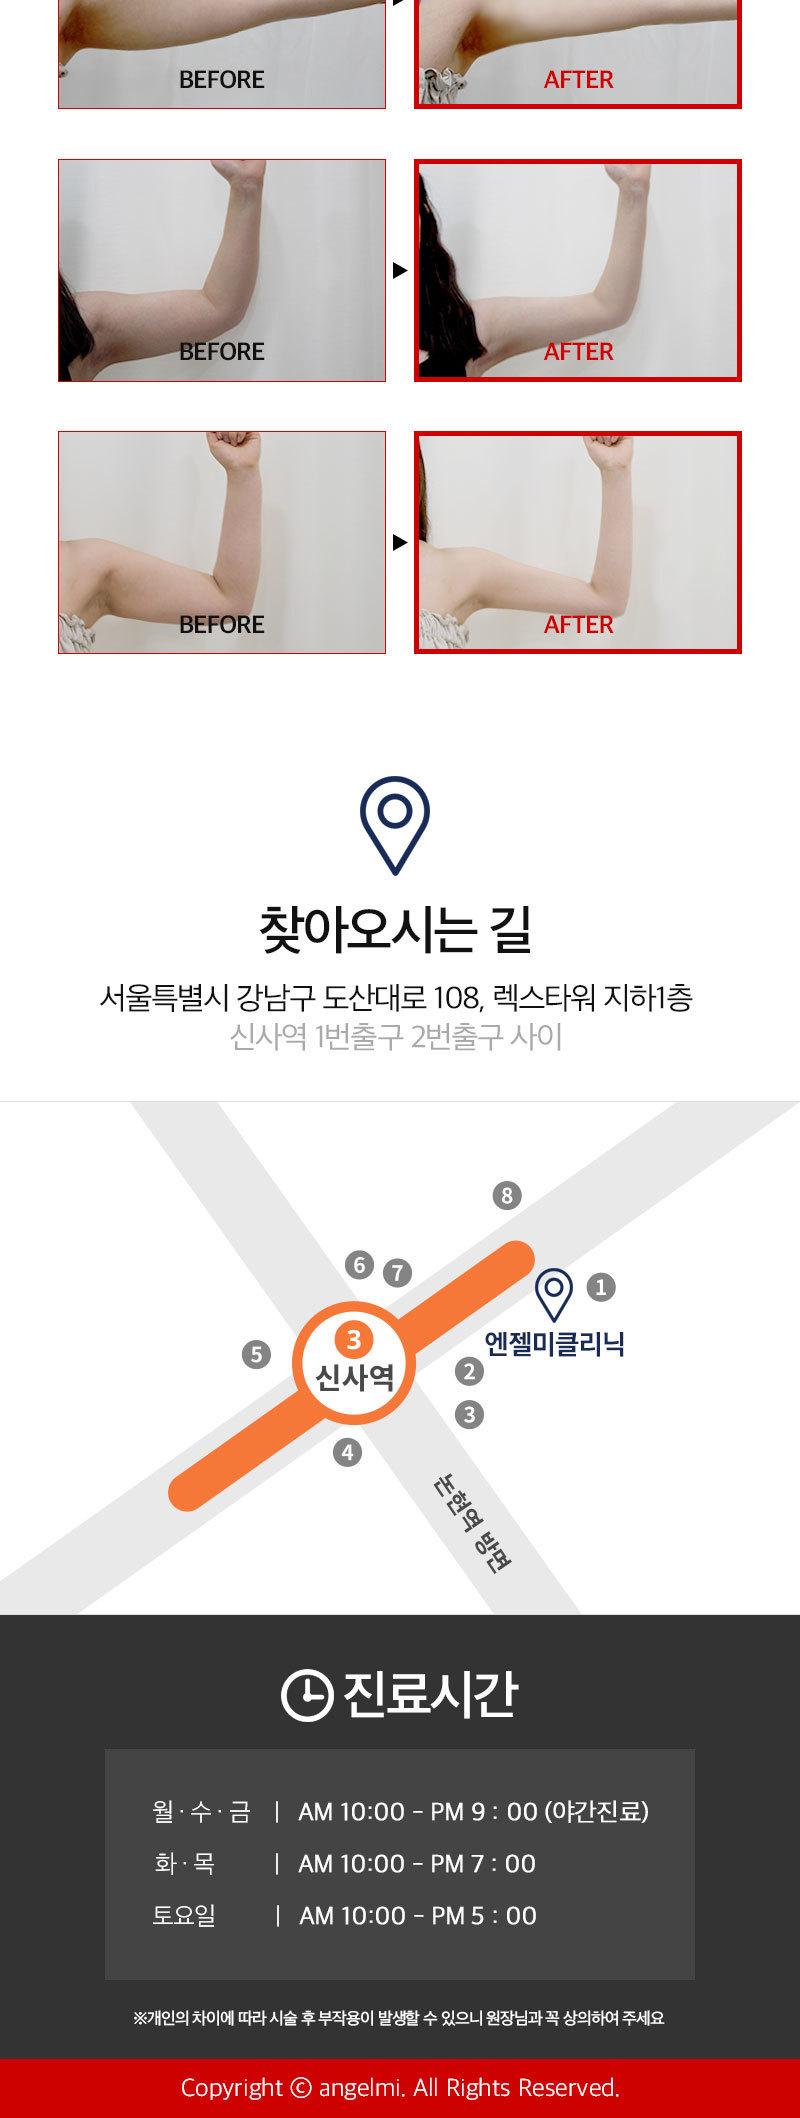 D event info 570037e0891c9917f5